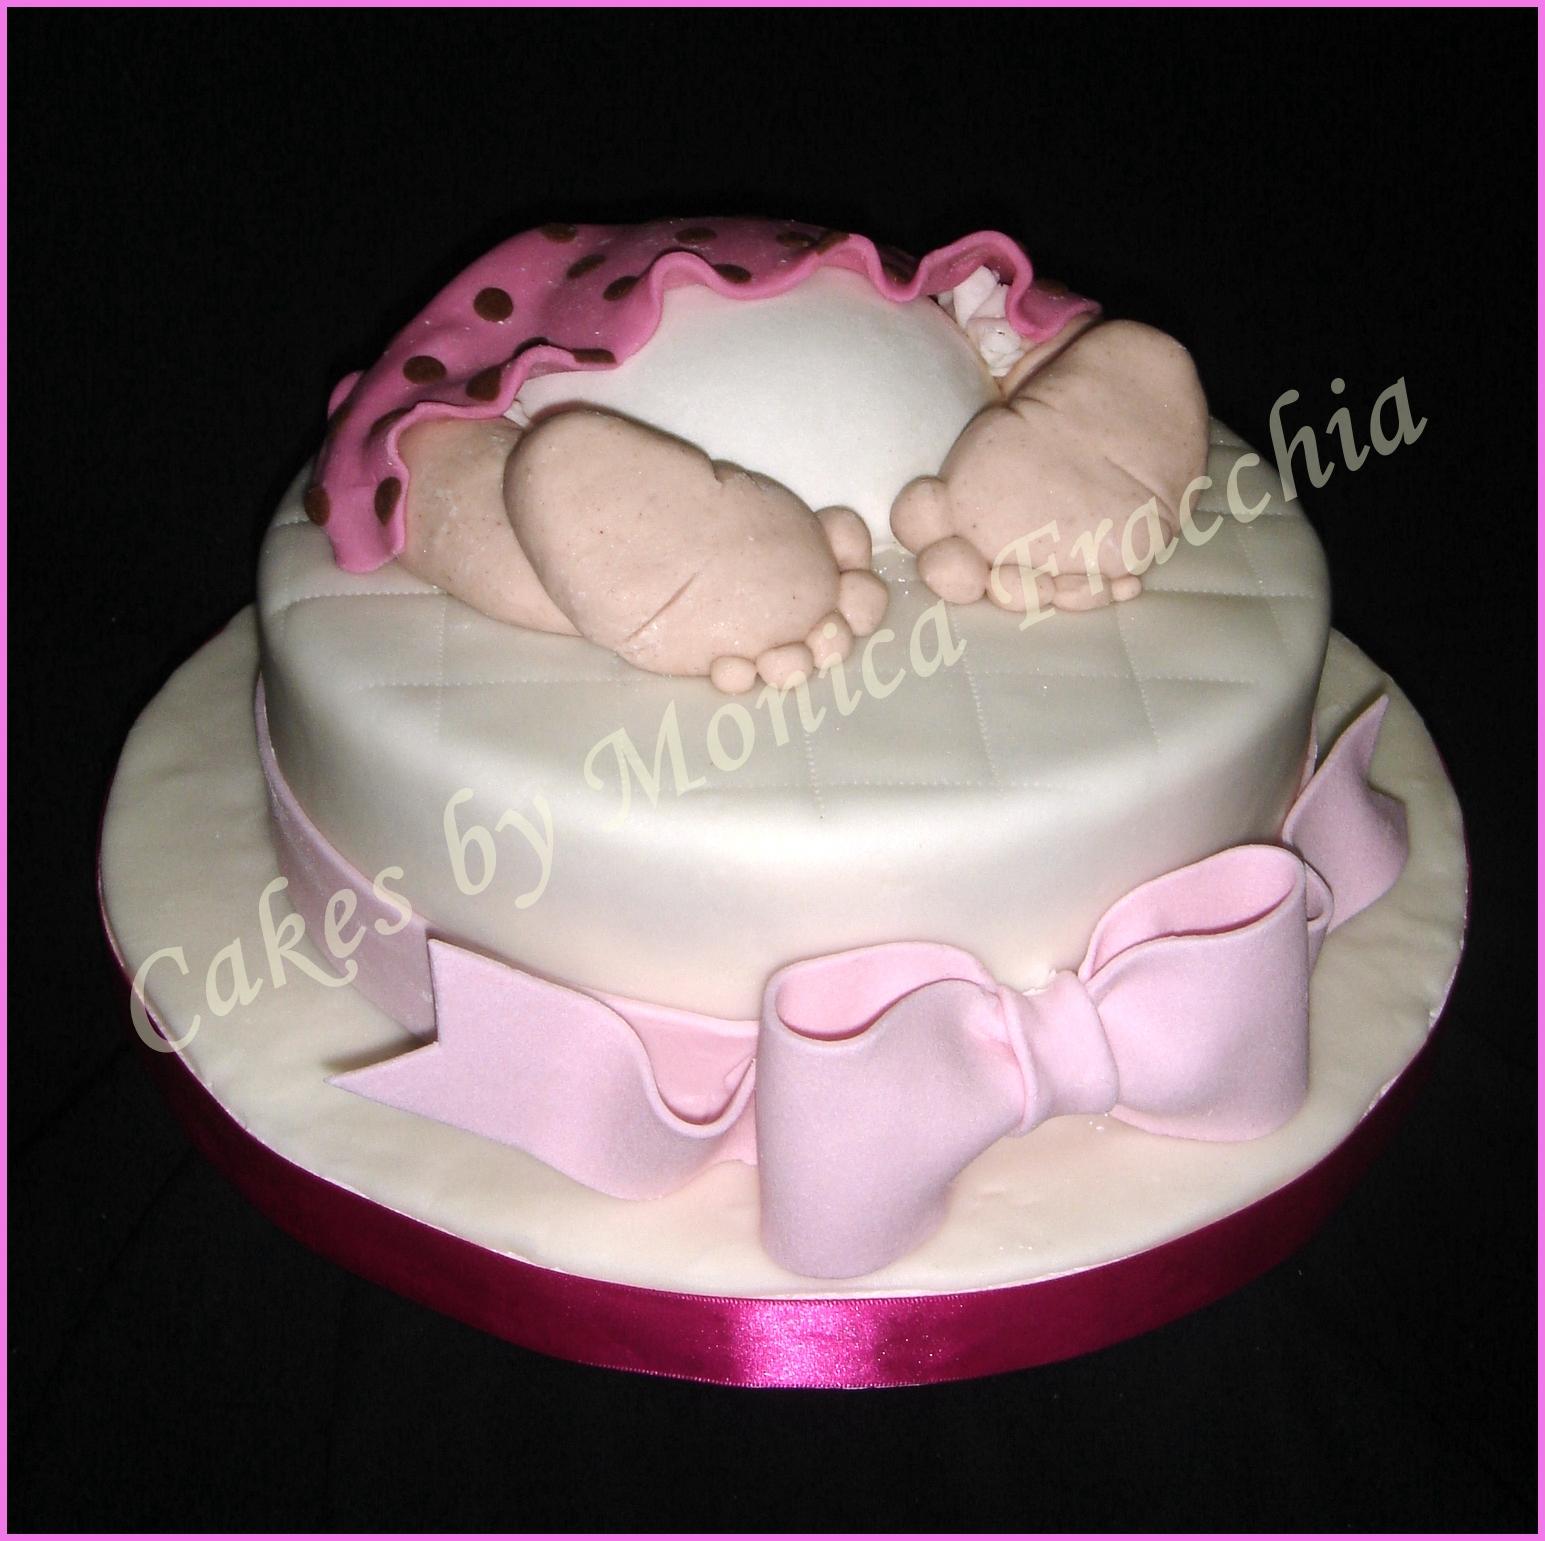 Imagenes tortas decorativas baby shower imagui - Baby shower de nina ...